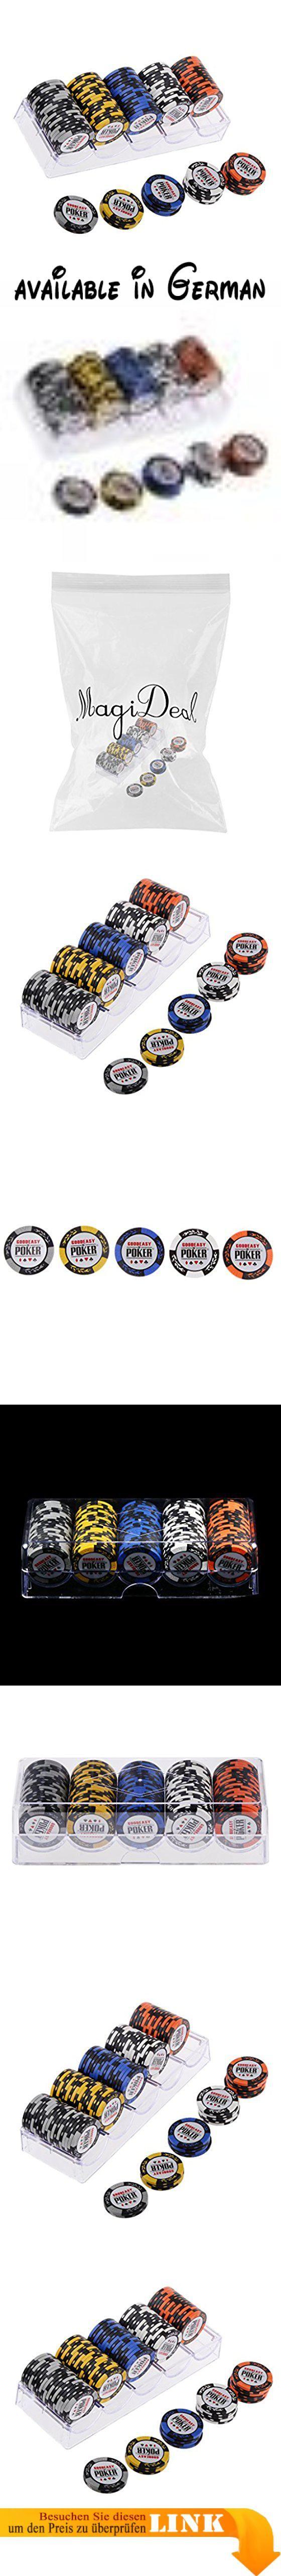 Pcs Clay Poker Chips For Mahjong Texas Poker G Für - Minecraft spiele auf poki